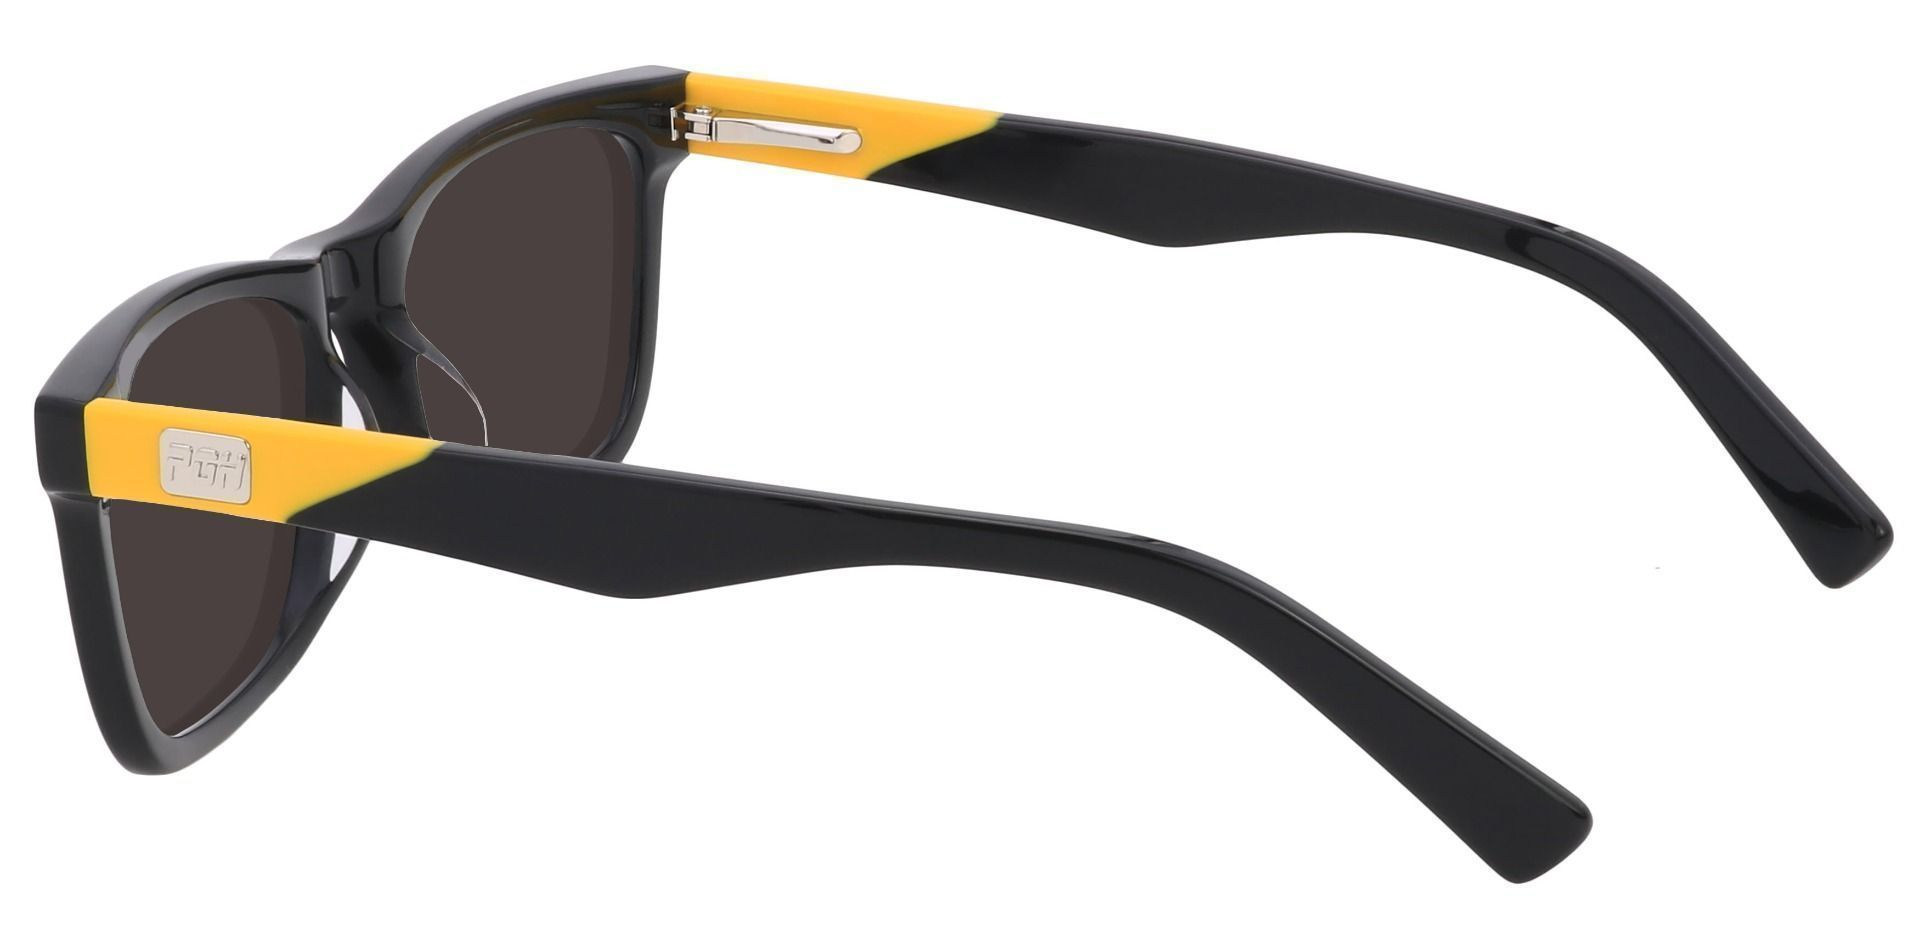 Liberty Rectangle Prescription Sunglasses - Black Frame With Gray Lenses